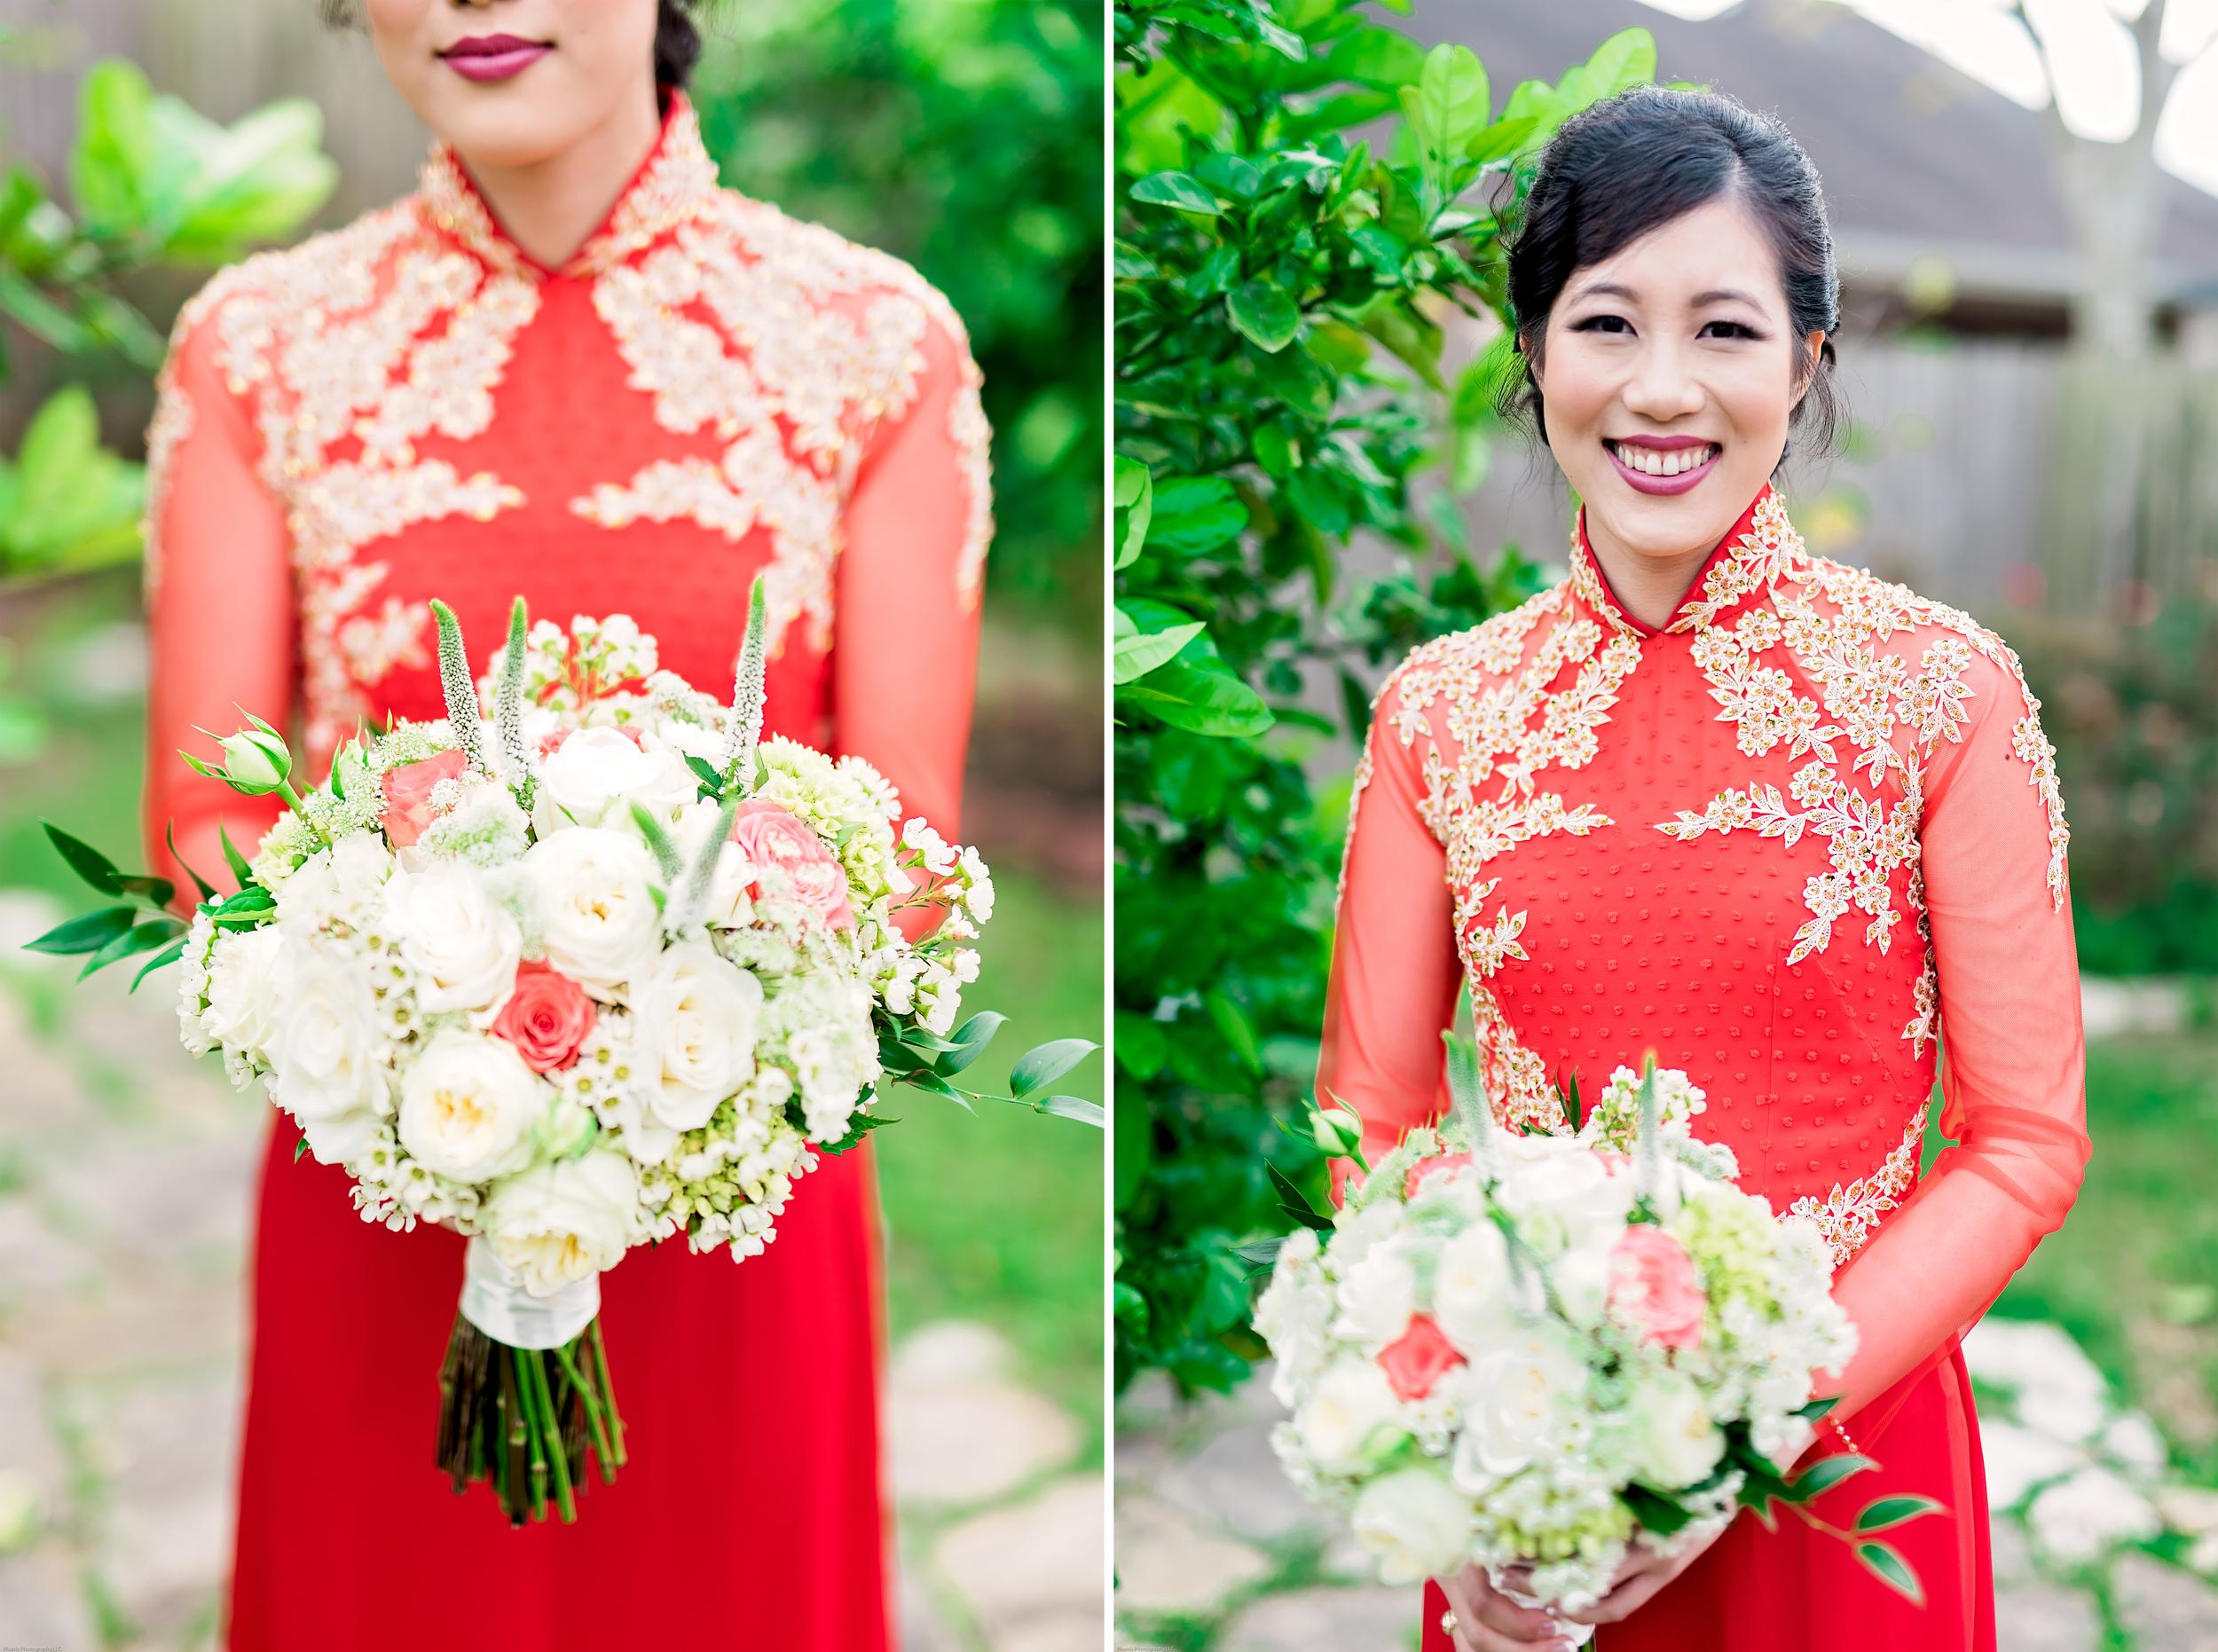 Houston Wedding- Texas Photographer- Pharris Photography- Kathy and Tho- Bridal Bouquet